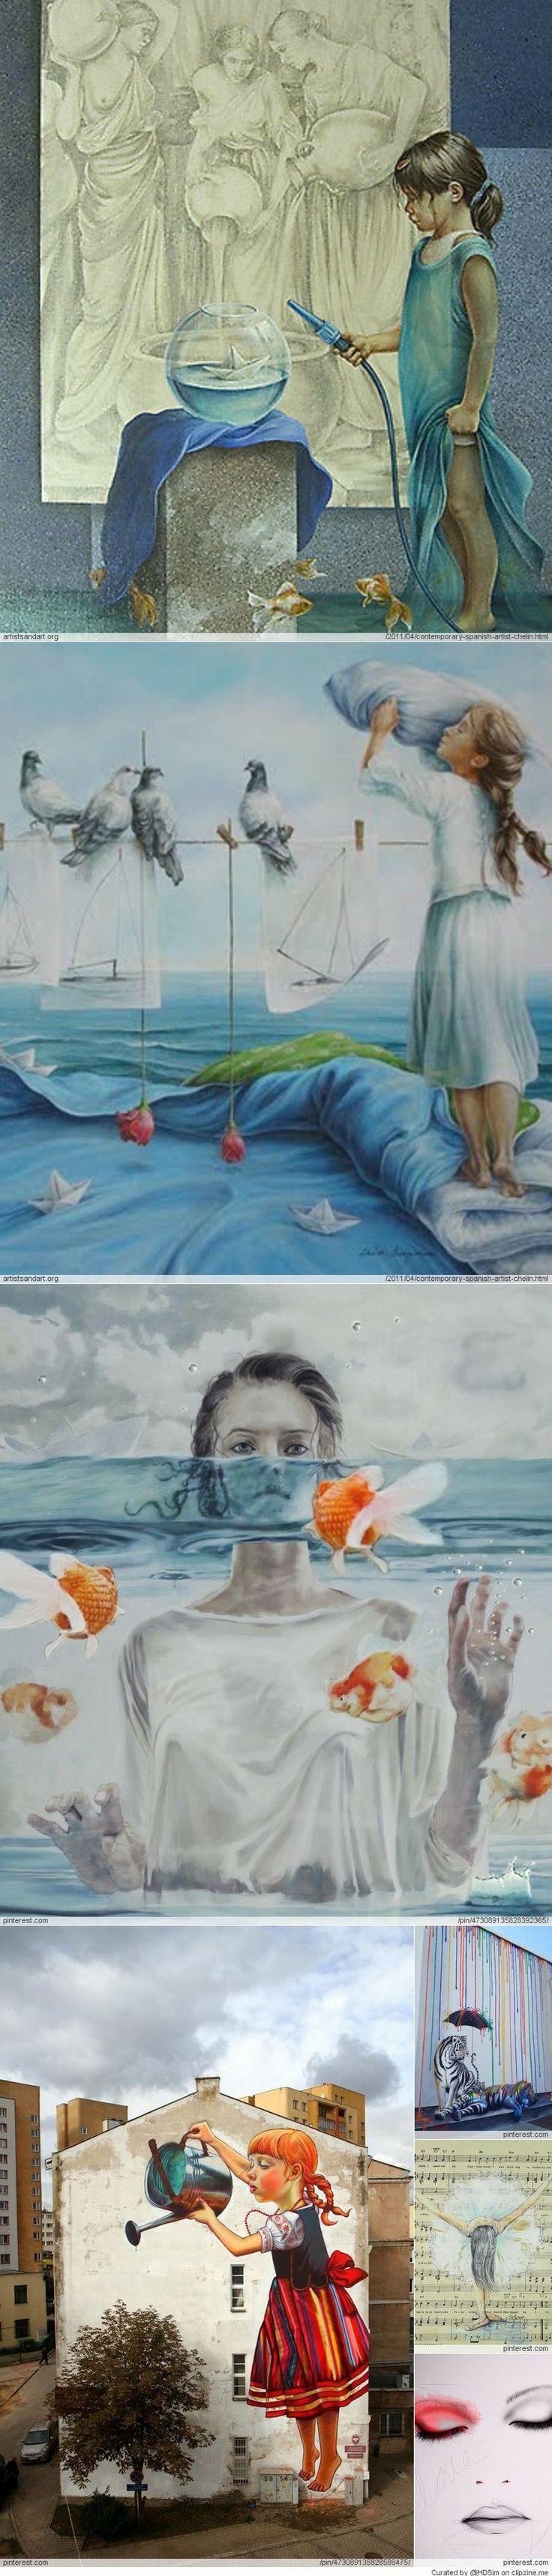 Artists & Arts